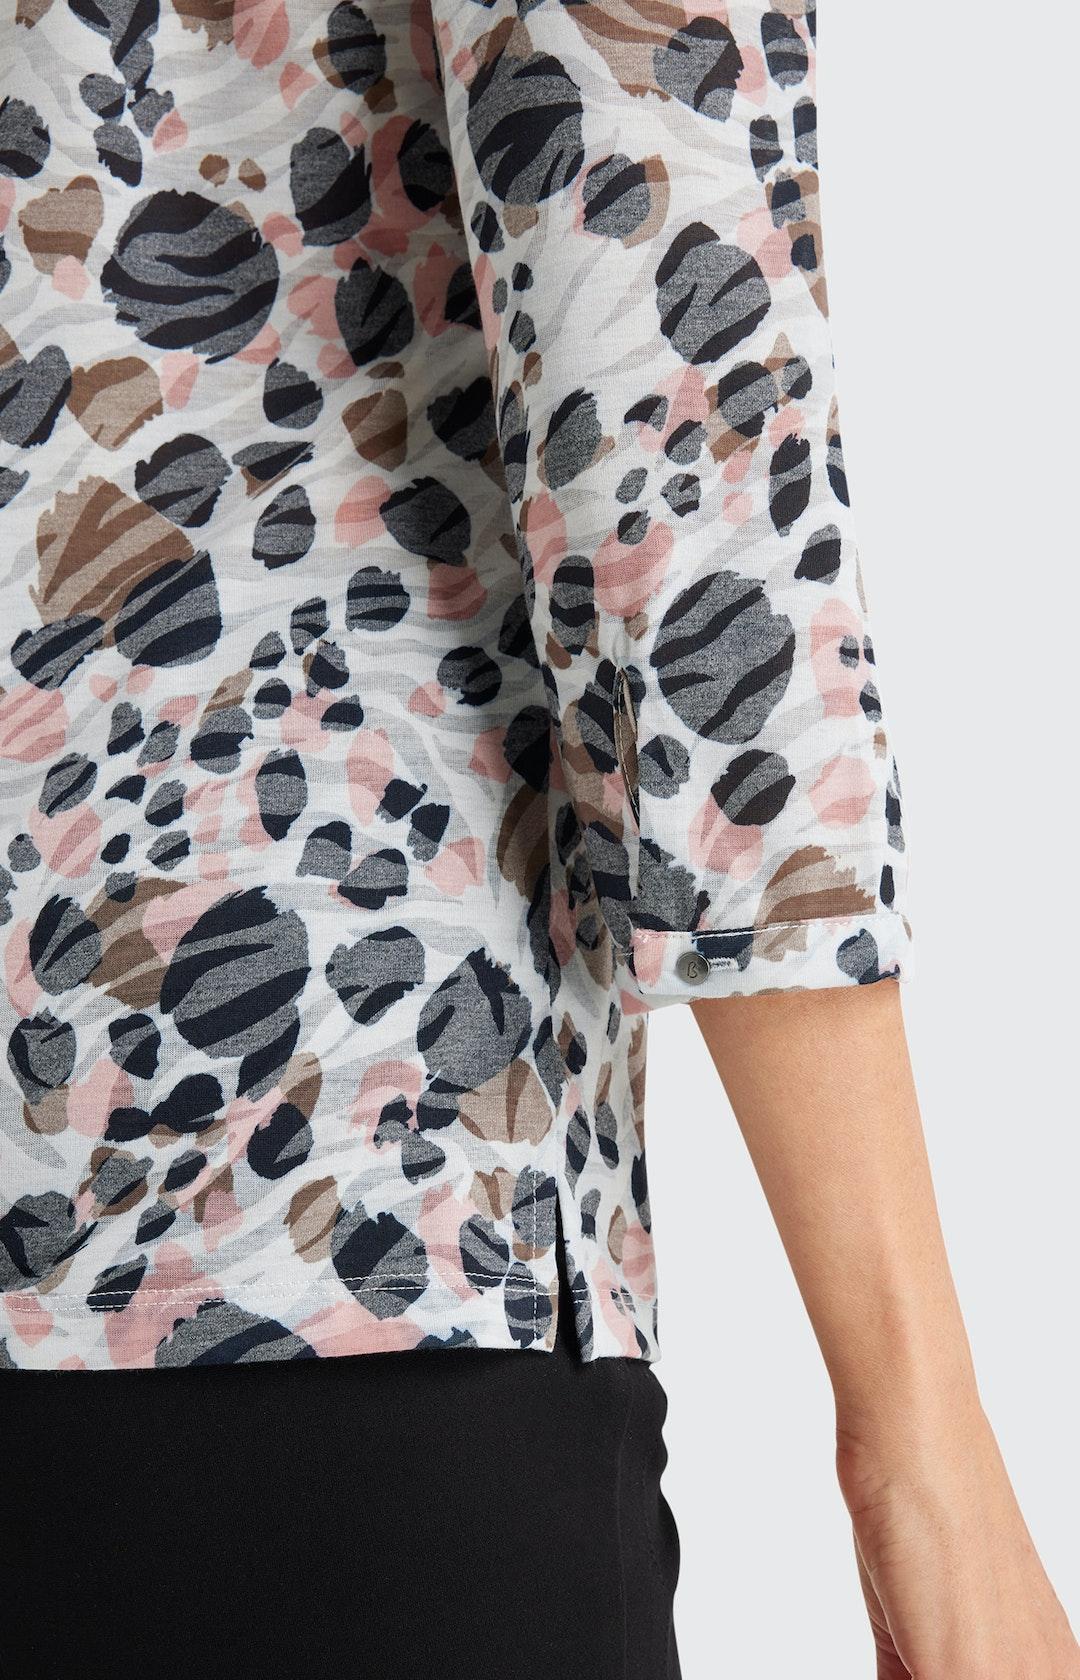 Shirtbluse mit Allover-Muster in Weiß